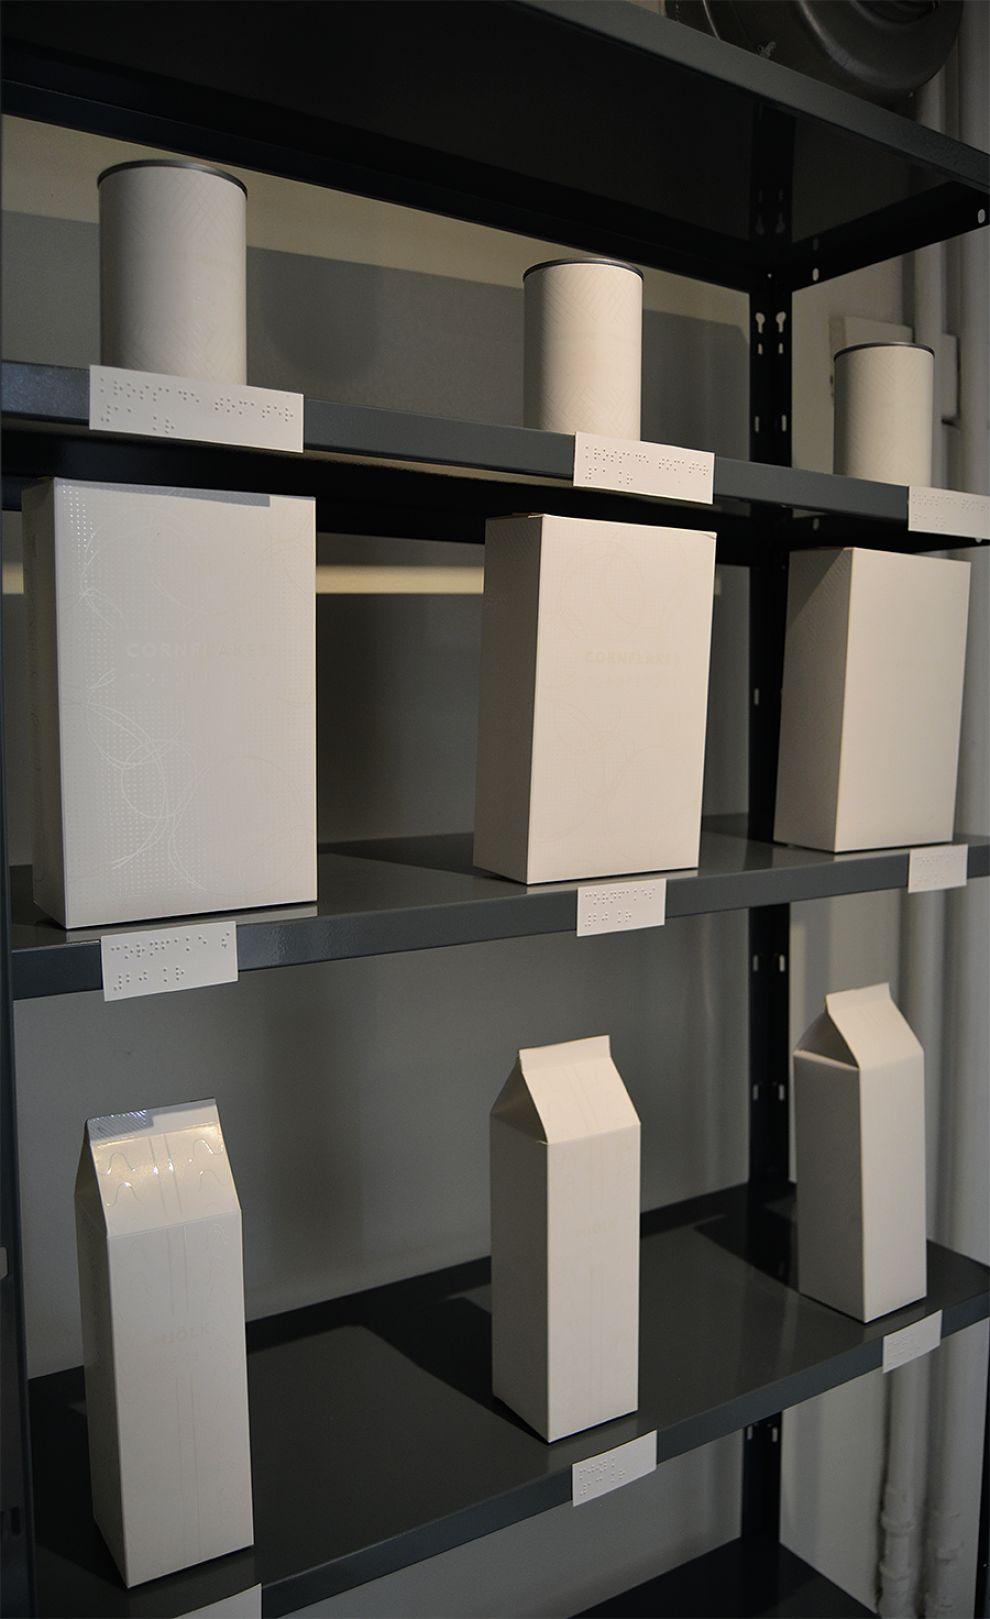 Color Me Blind Clean Package Design